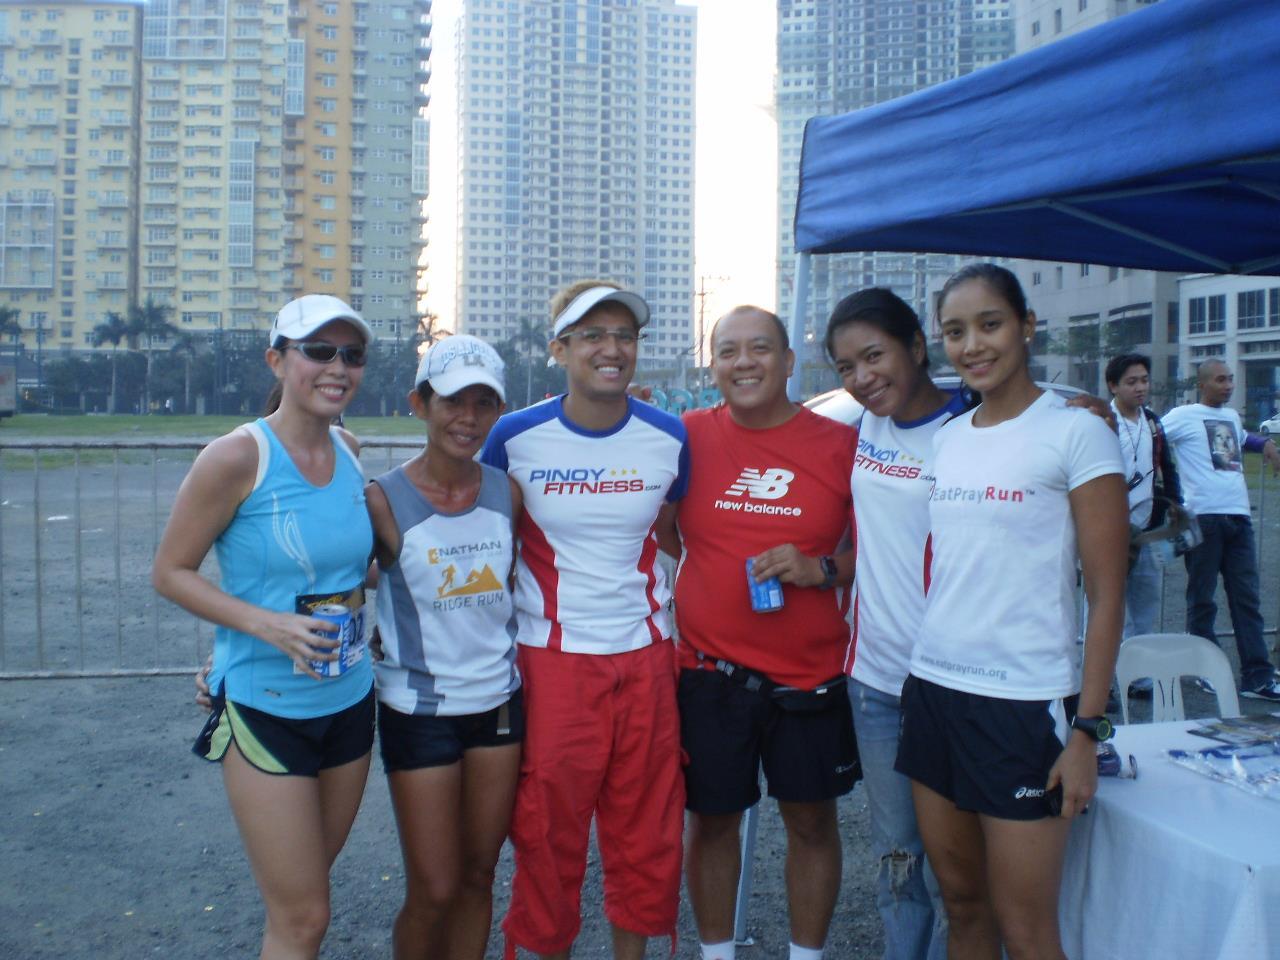 Todo Responde Run: After the Race